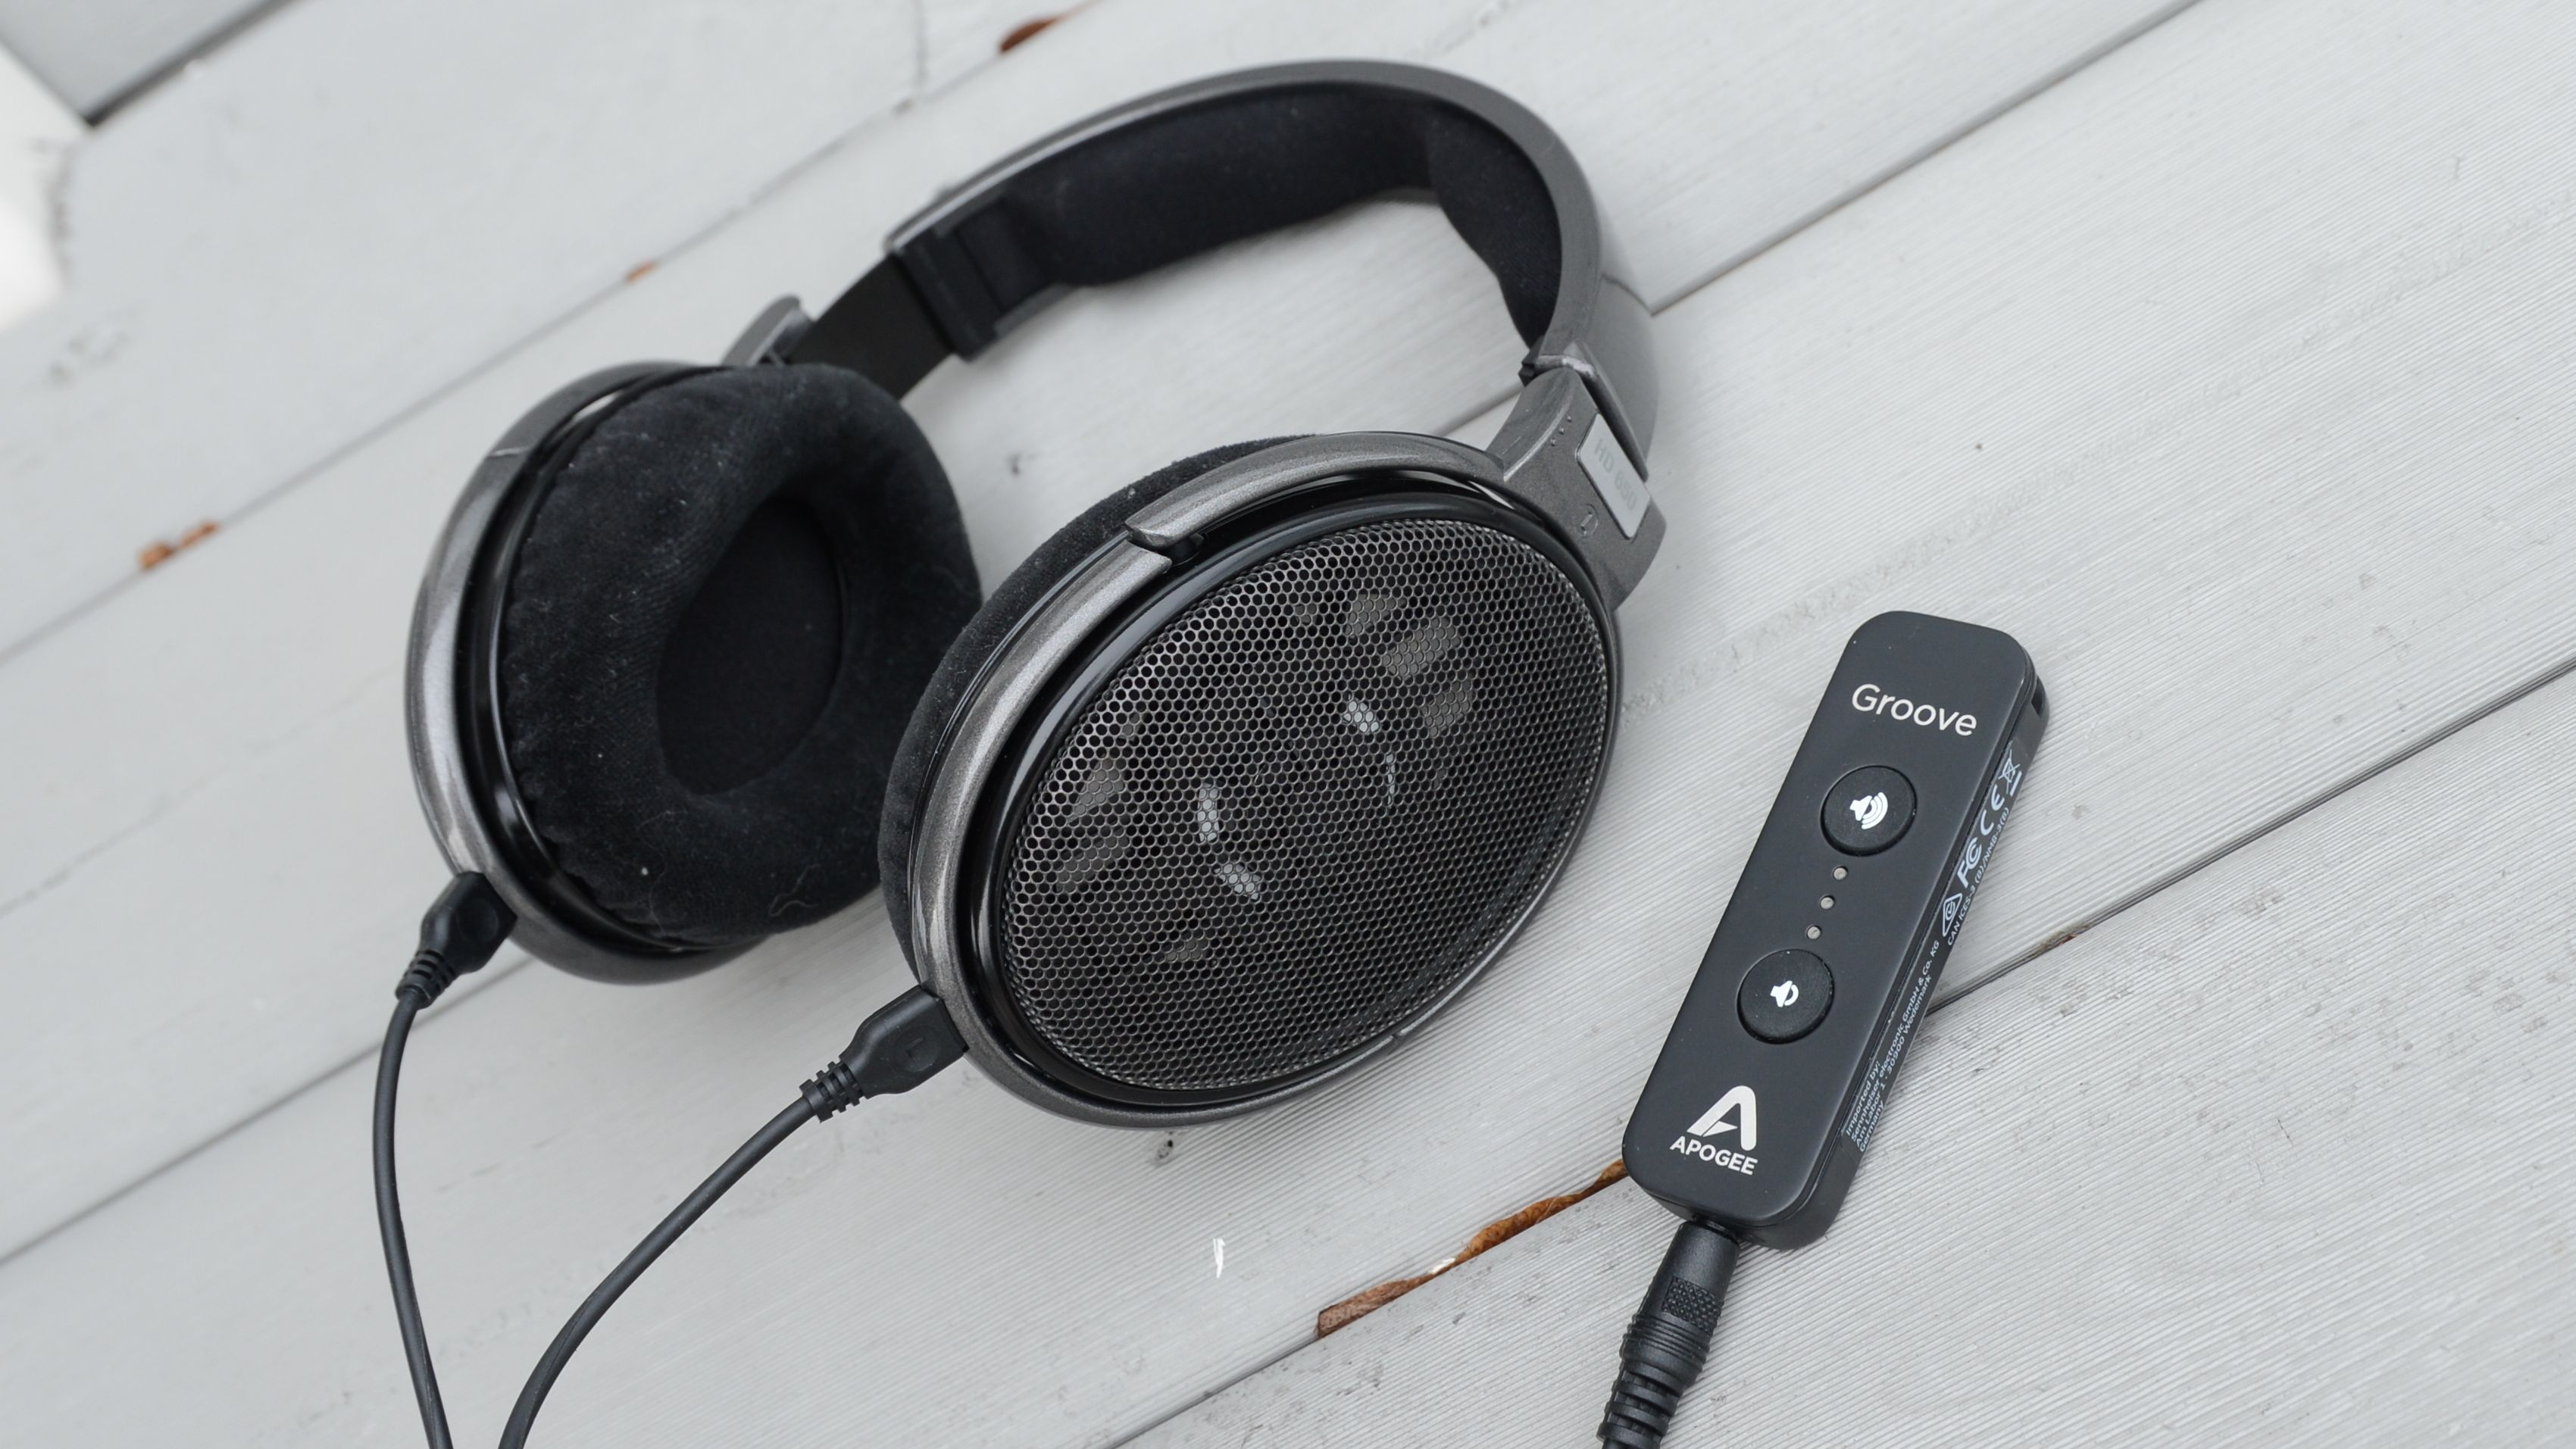 Sennheiser HD650 og Apogee Groove